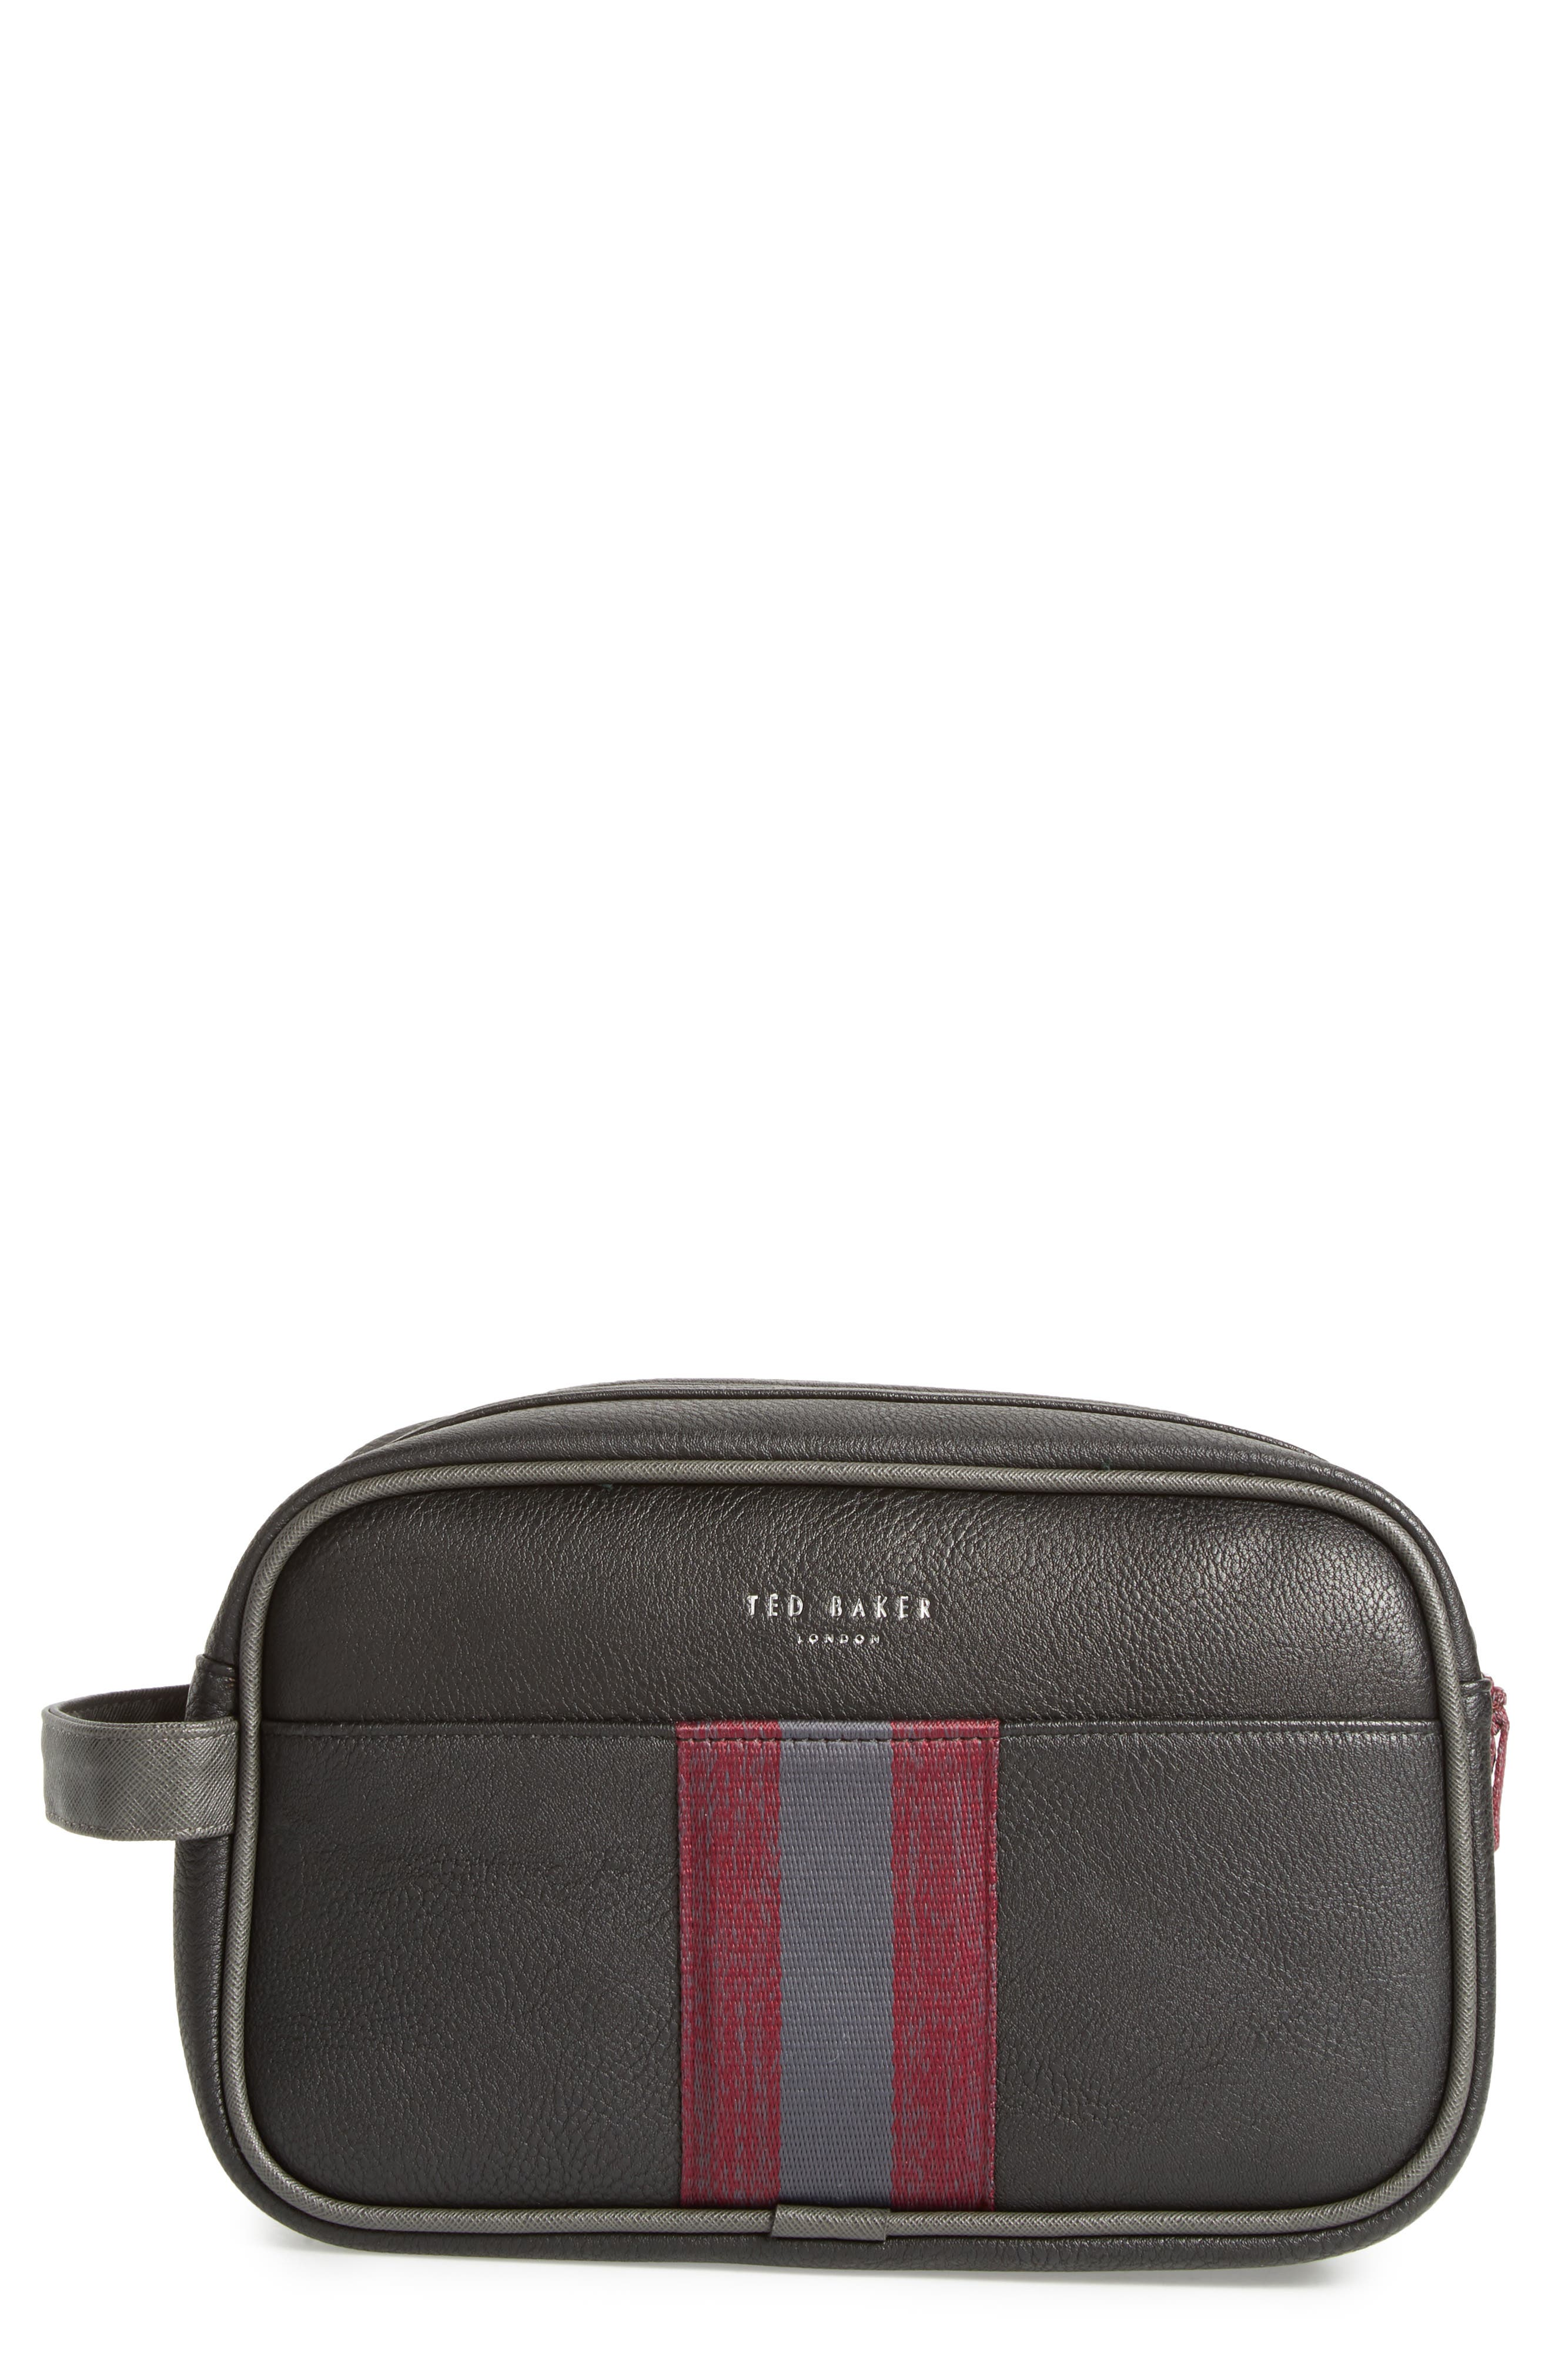 Pidgy Faux Leather Travel Kit,                         Main,                         color, Black